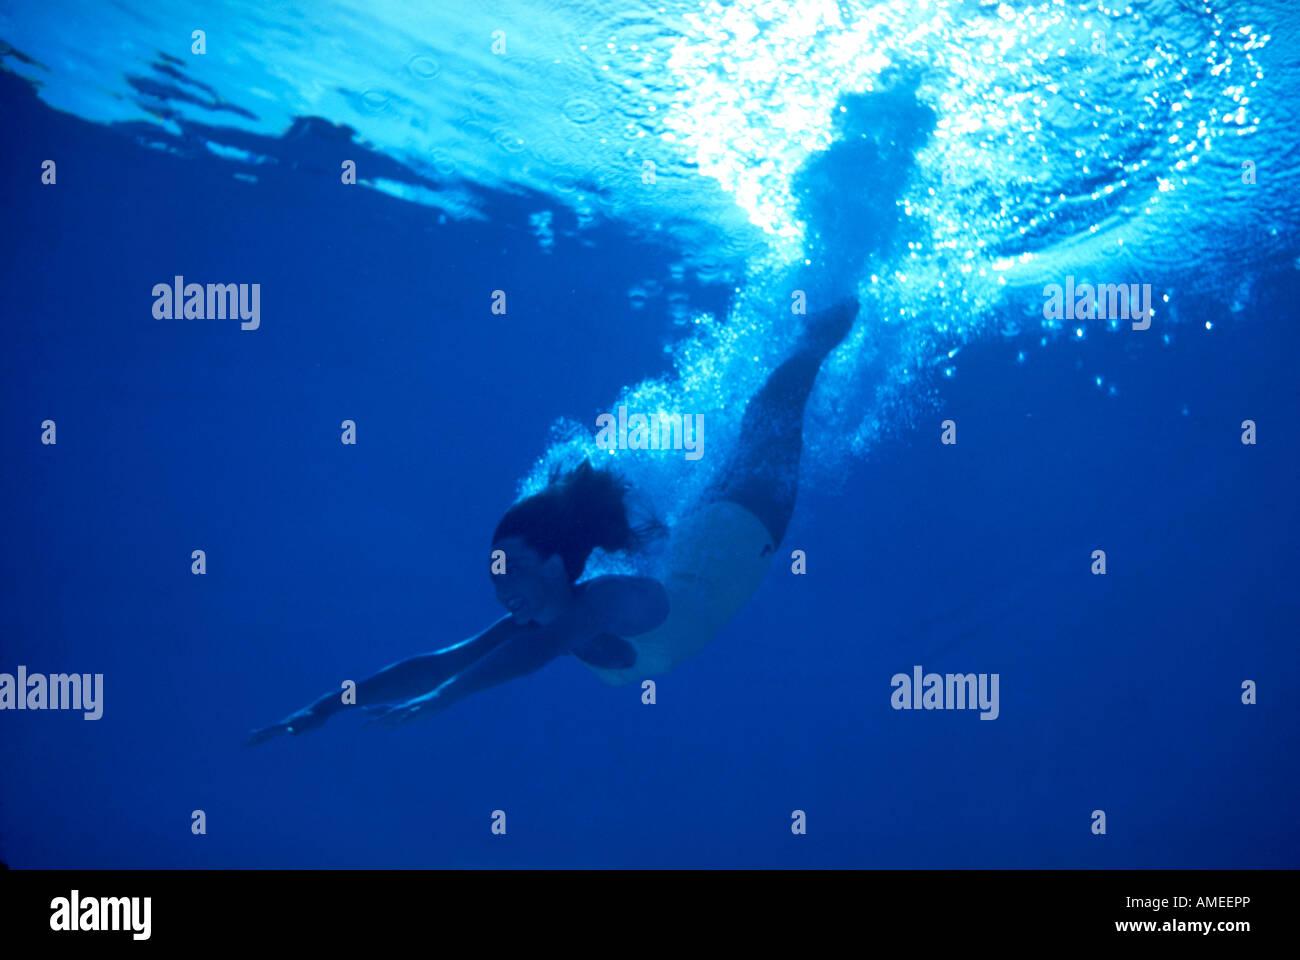 Chica submarino buceo en nube de burbujas. Imagen De Stock